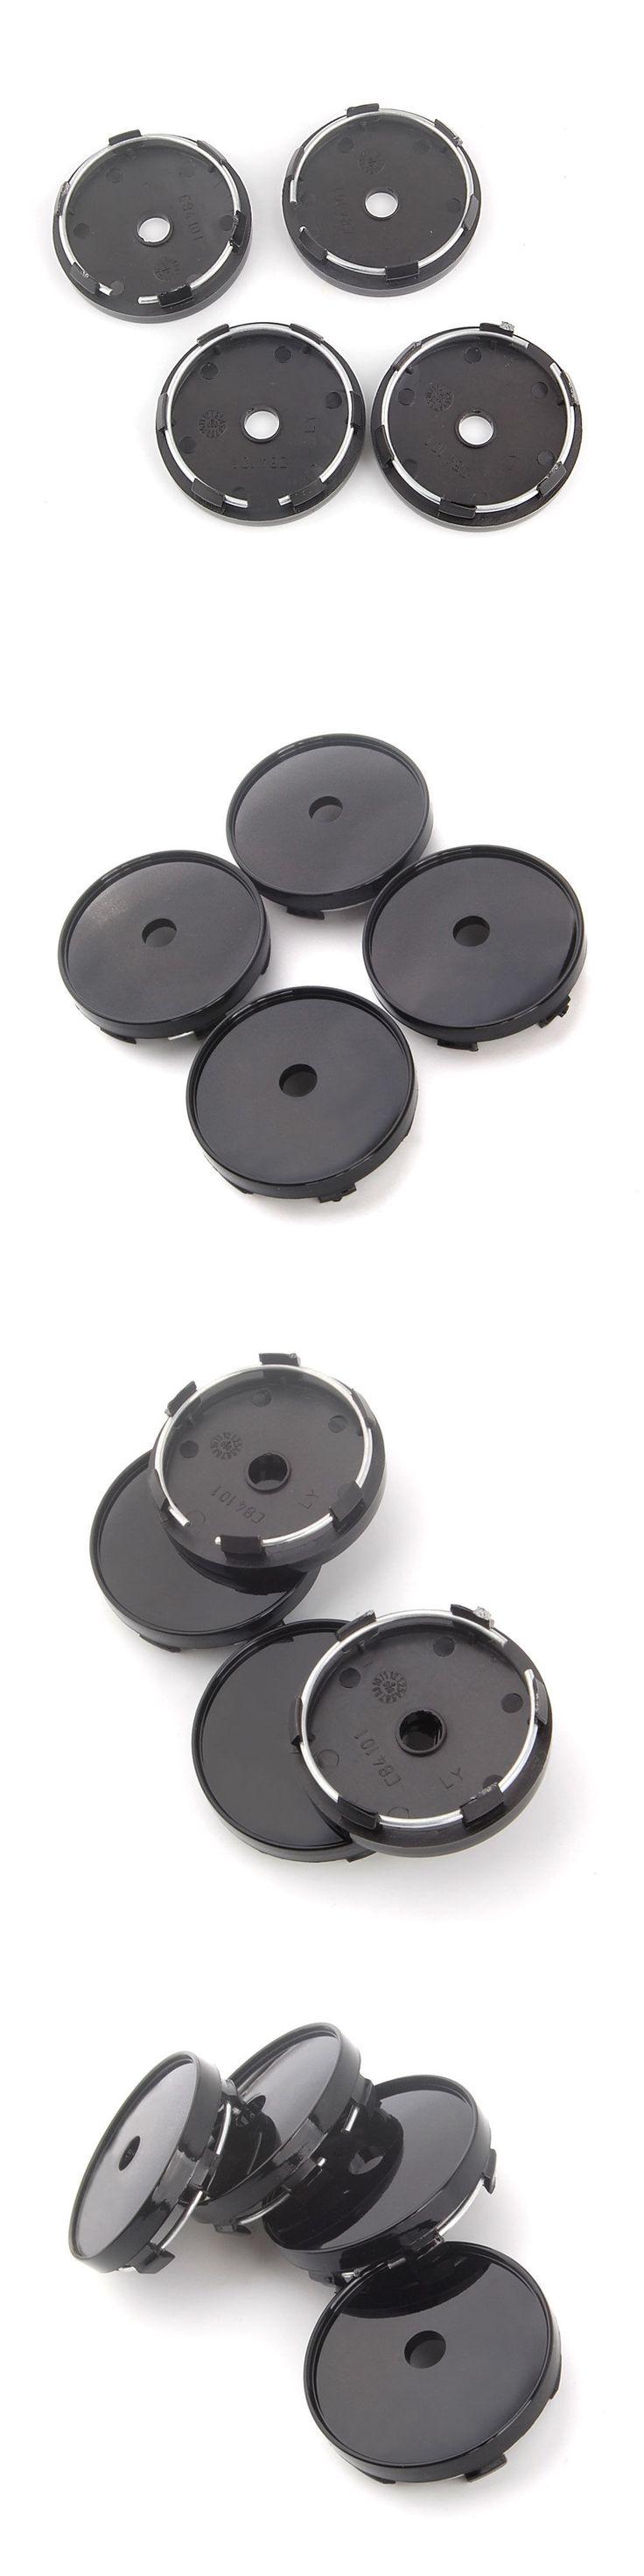 Black SUV Car Wheel Center Cap Covers 60mm Diameter Rim Hole No Logo Hubcap 4Pcs/set for RDX Q7 X1 Equinox Impala Escape